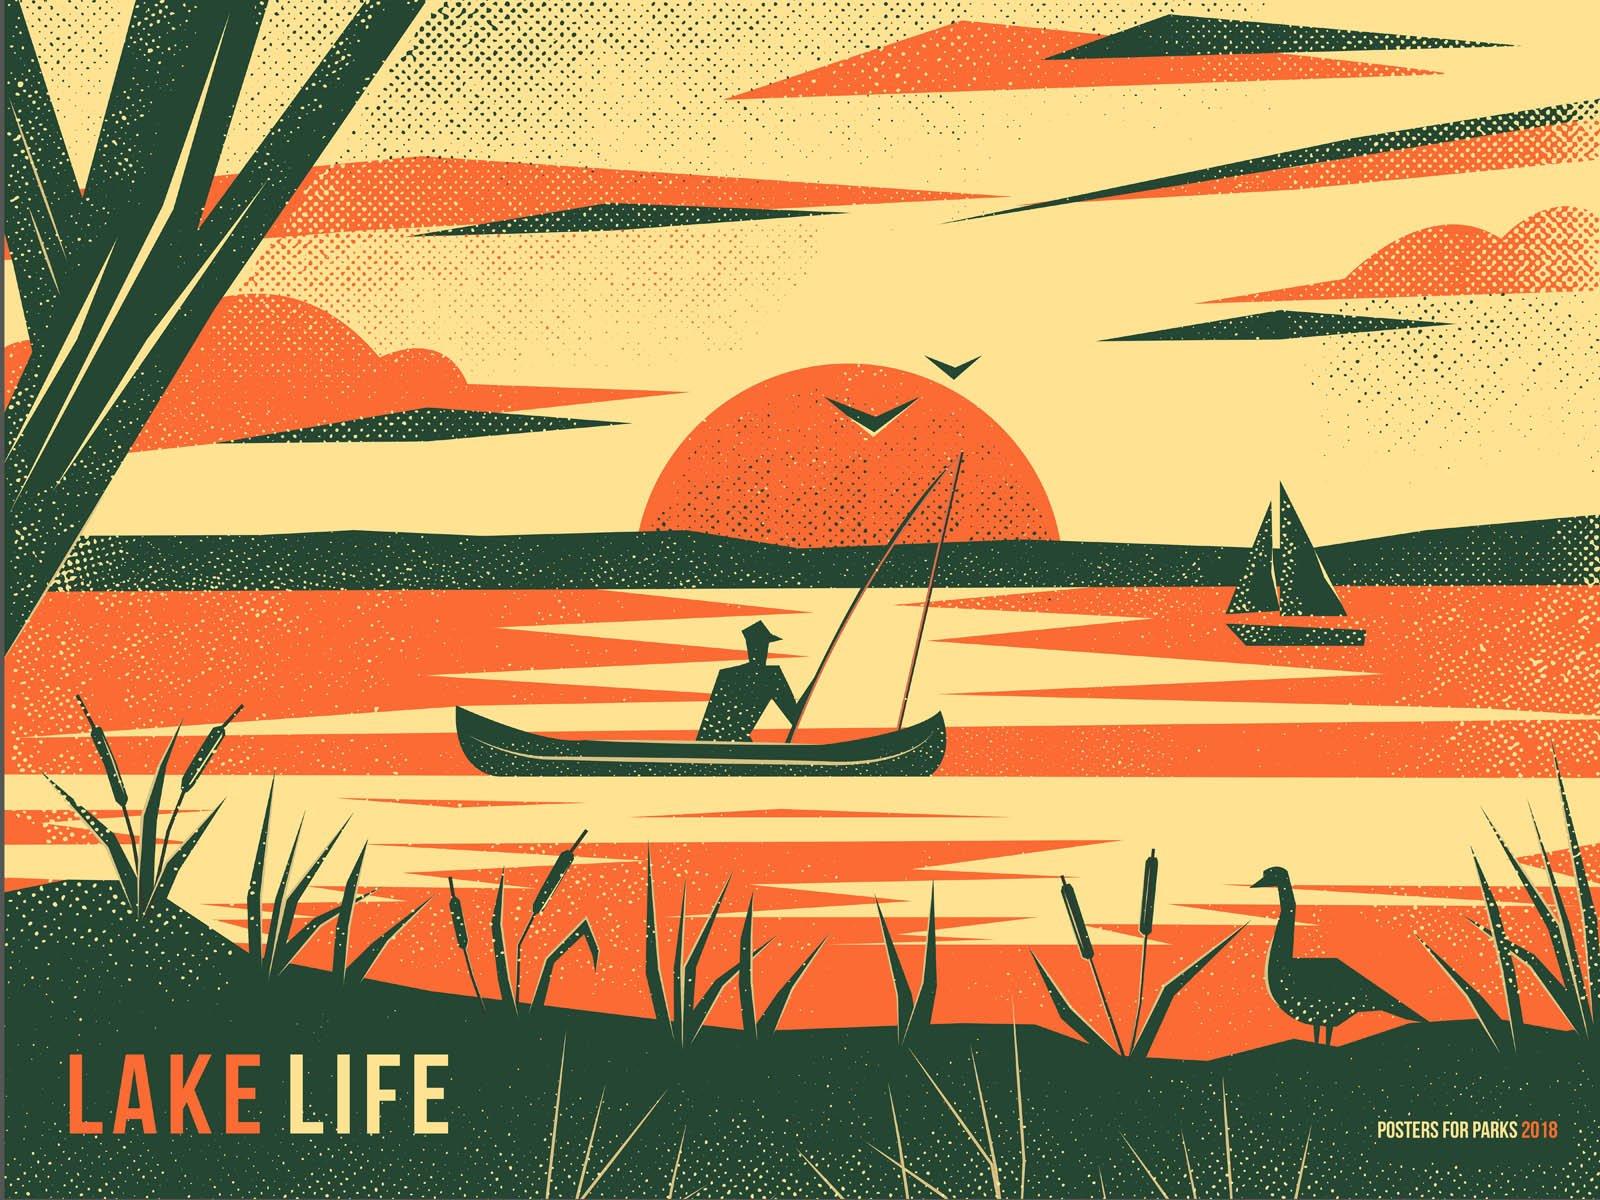 Lake Life poster by Ivine Badran